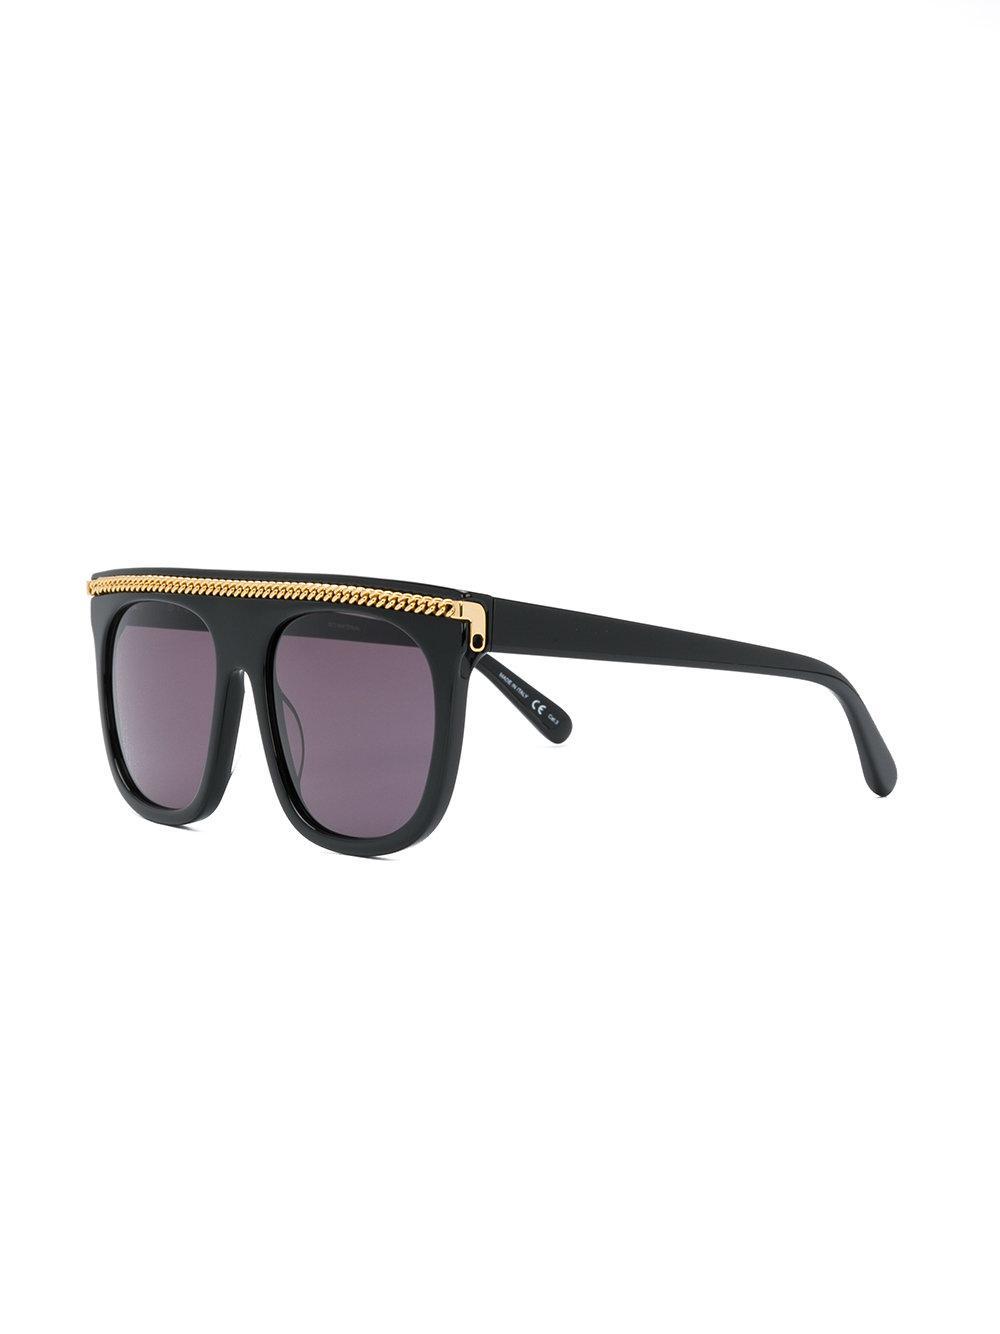 Stella McCartney Falabella Chain Flat Top Sunglasses in Black